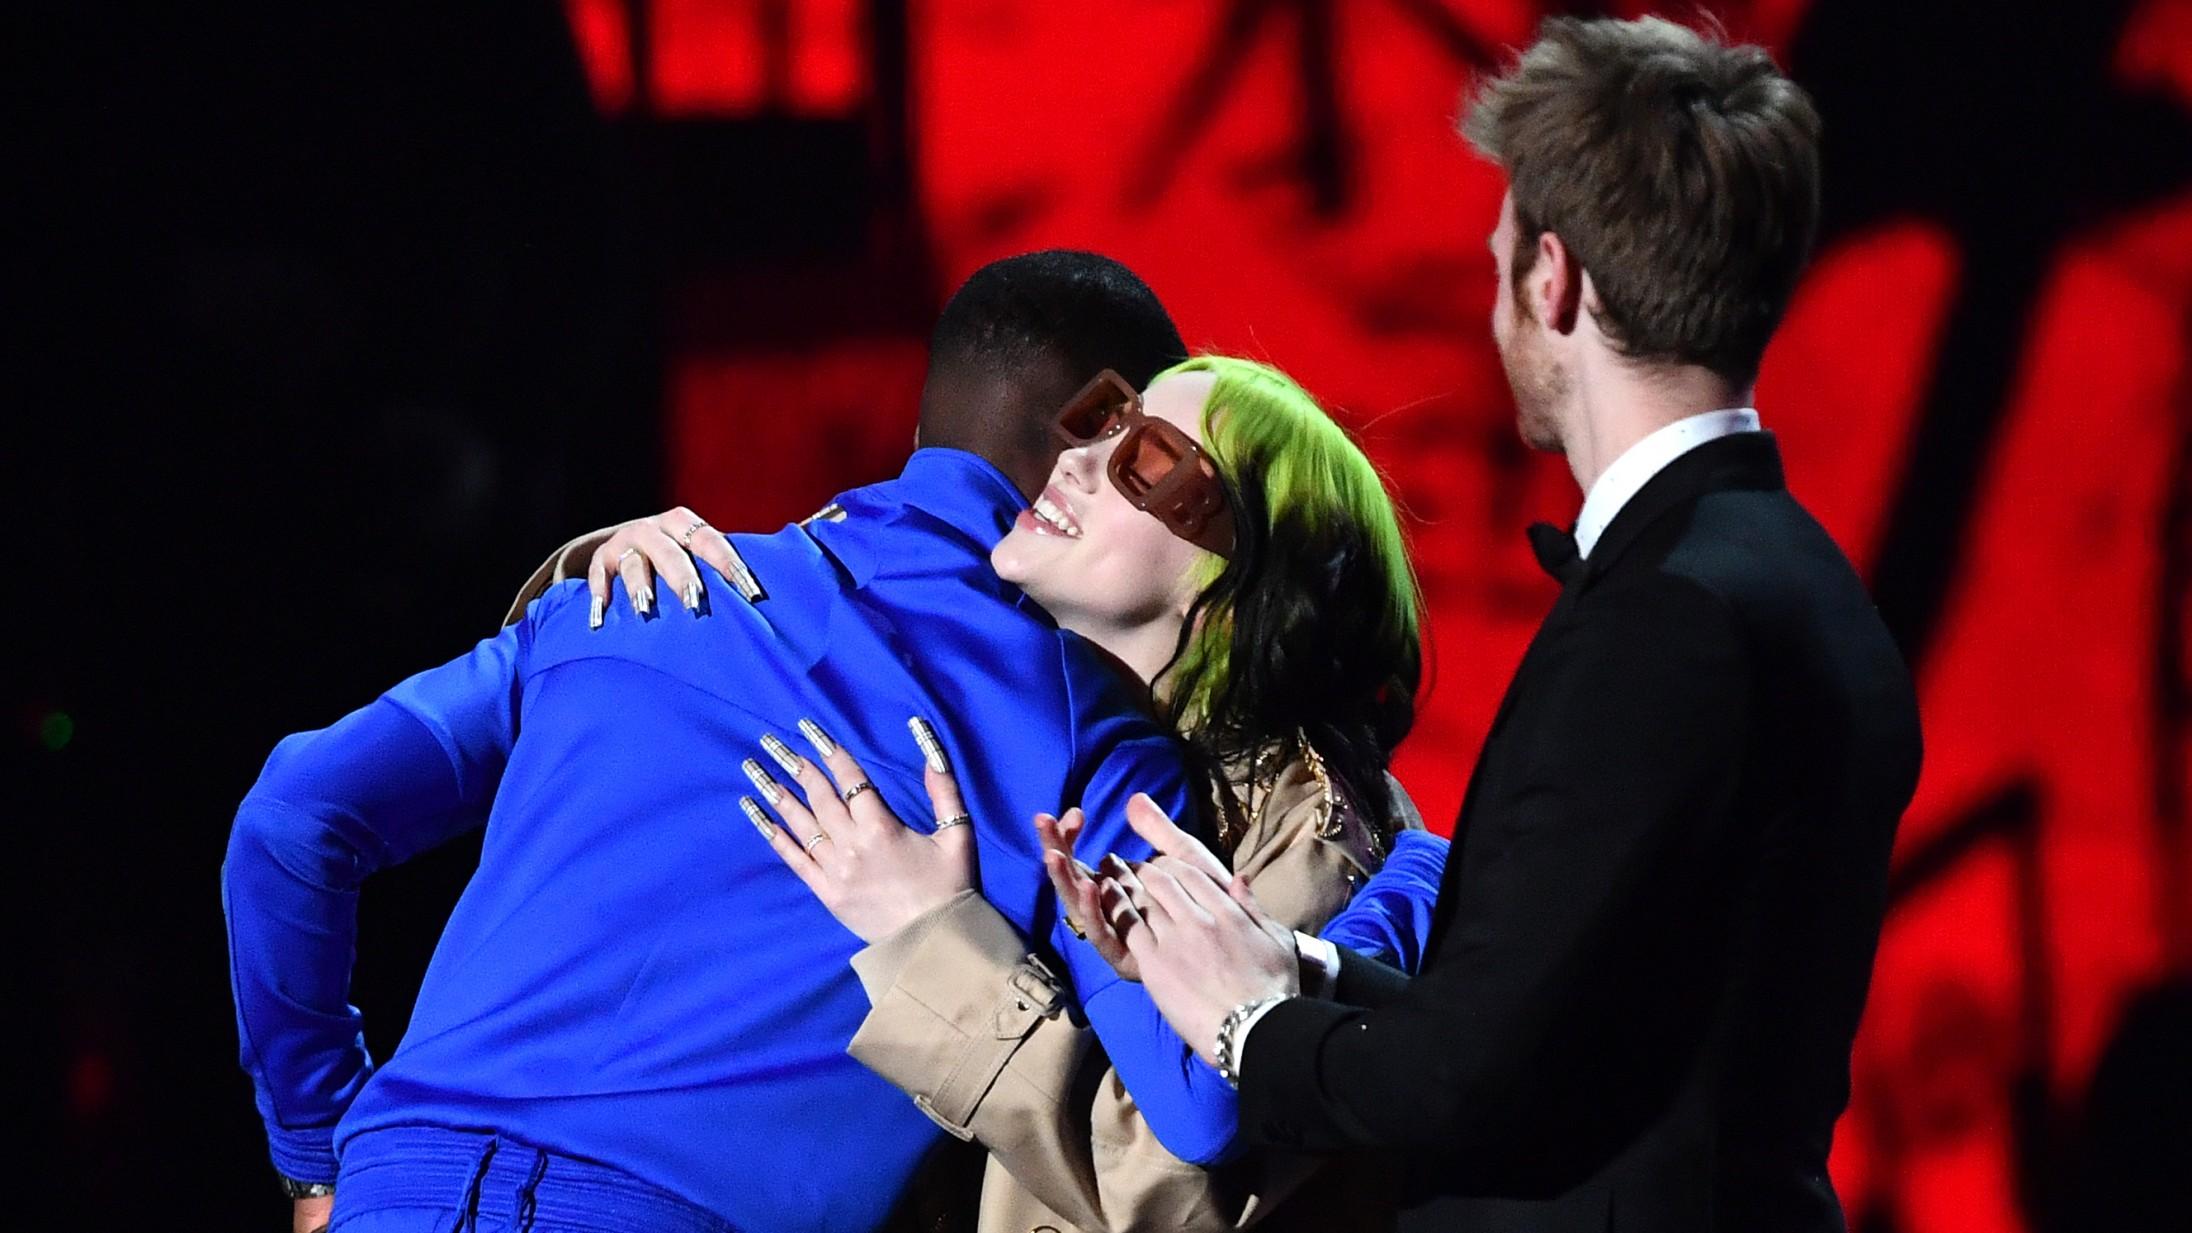 Se alle vinderne fra Brit Awards – Billie Eilish overrakte prisen for årets album